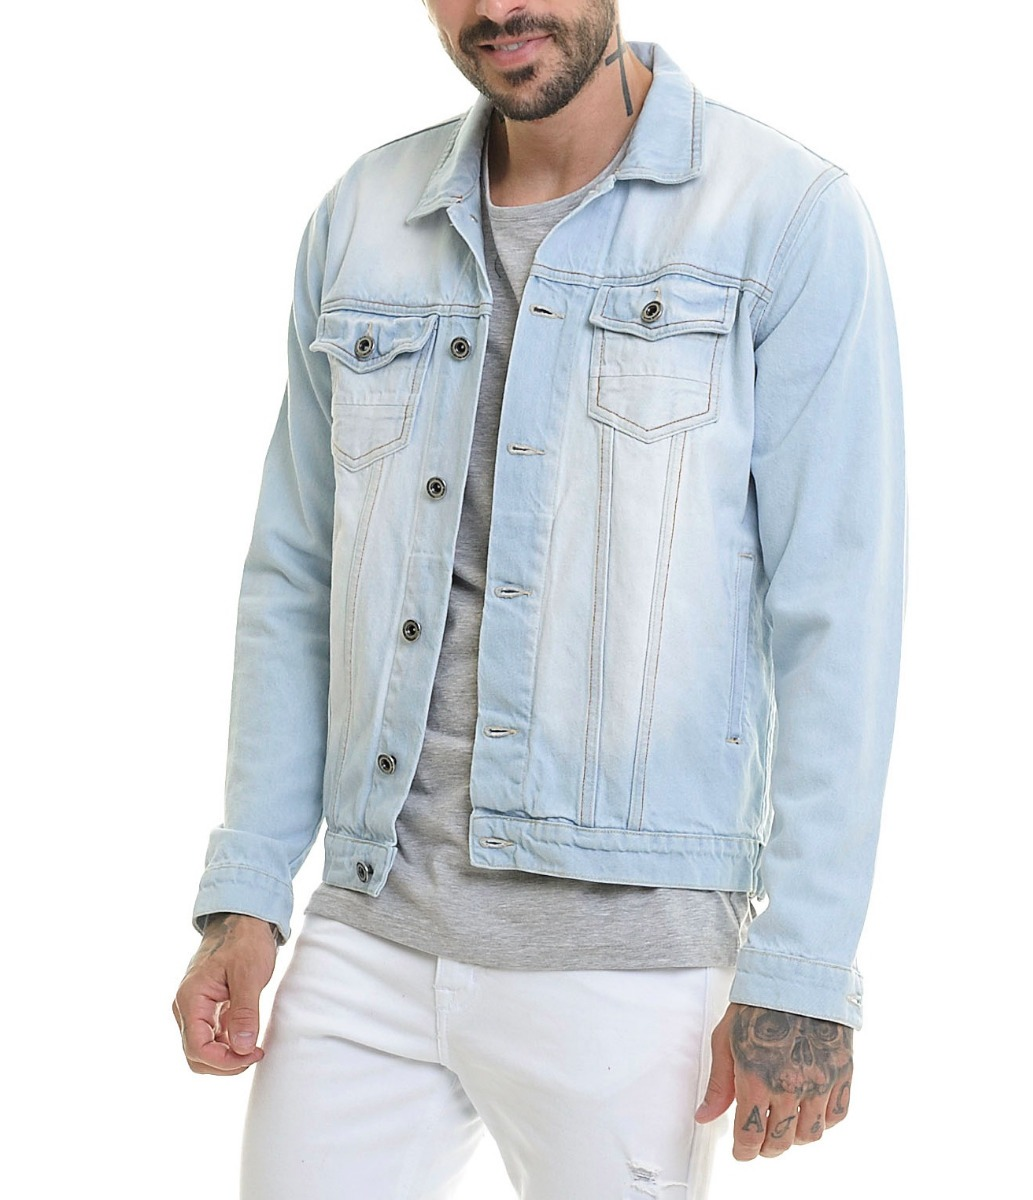 71b48bb5a6 Jaqueta Jeans Premium Escura Masculina Casaco Slim Offert - R  169 ...